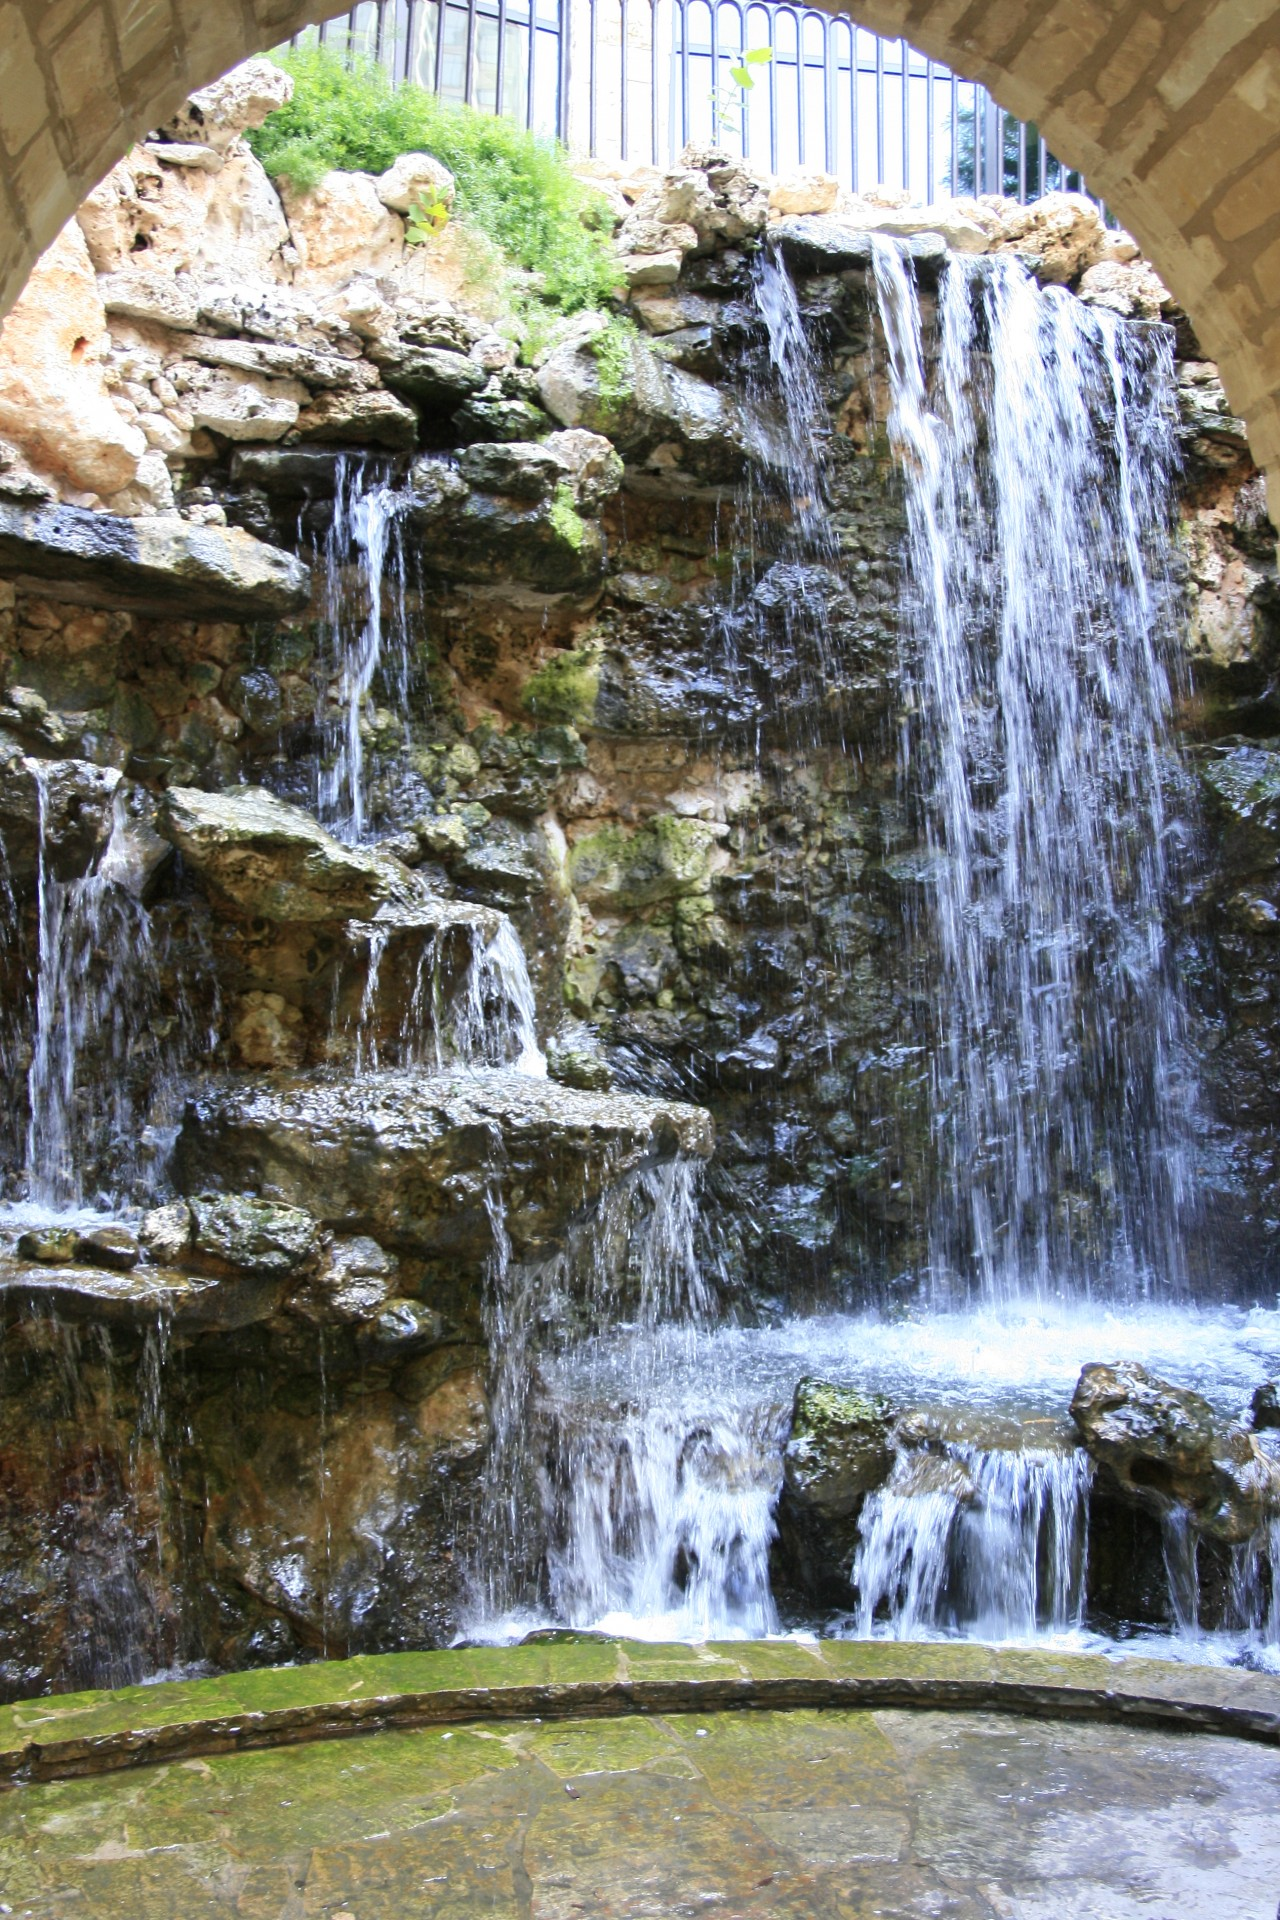 waterfalls, reflect, tranquility